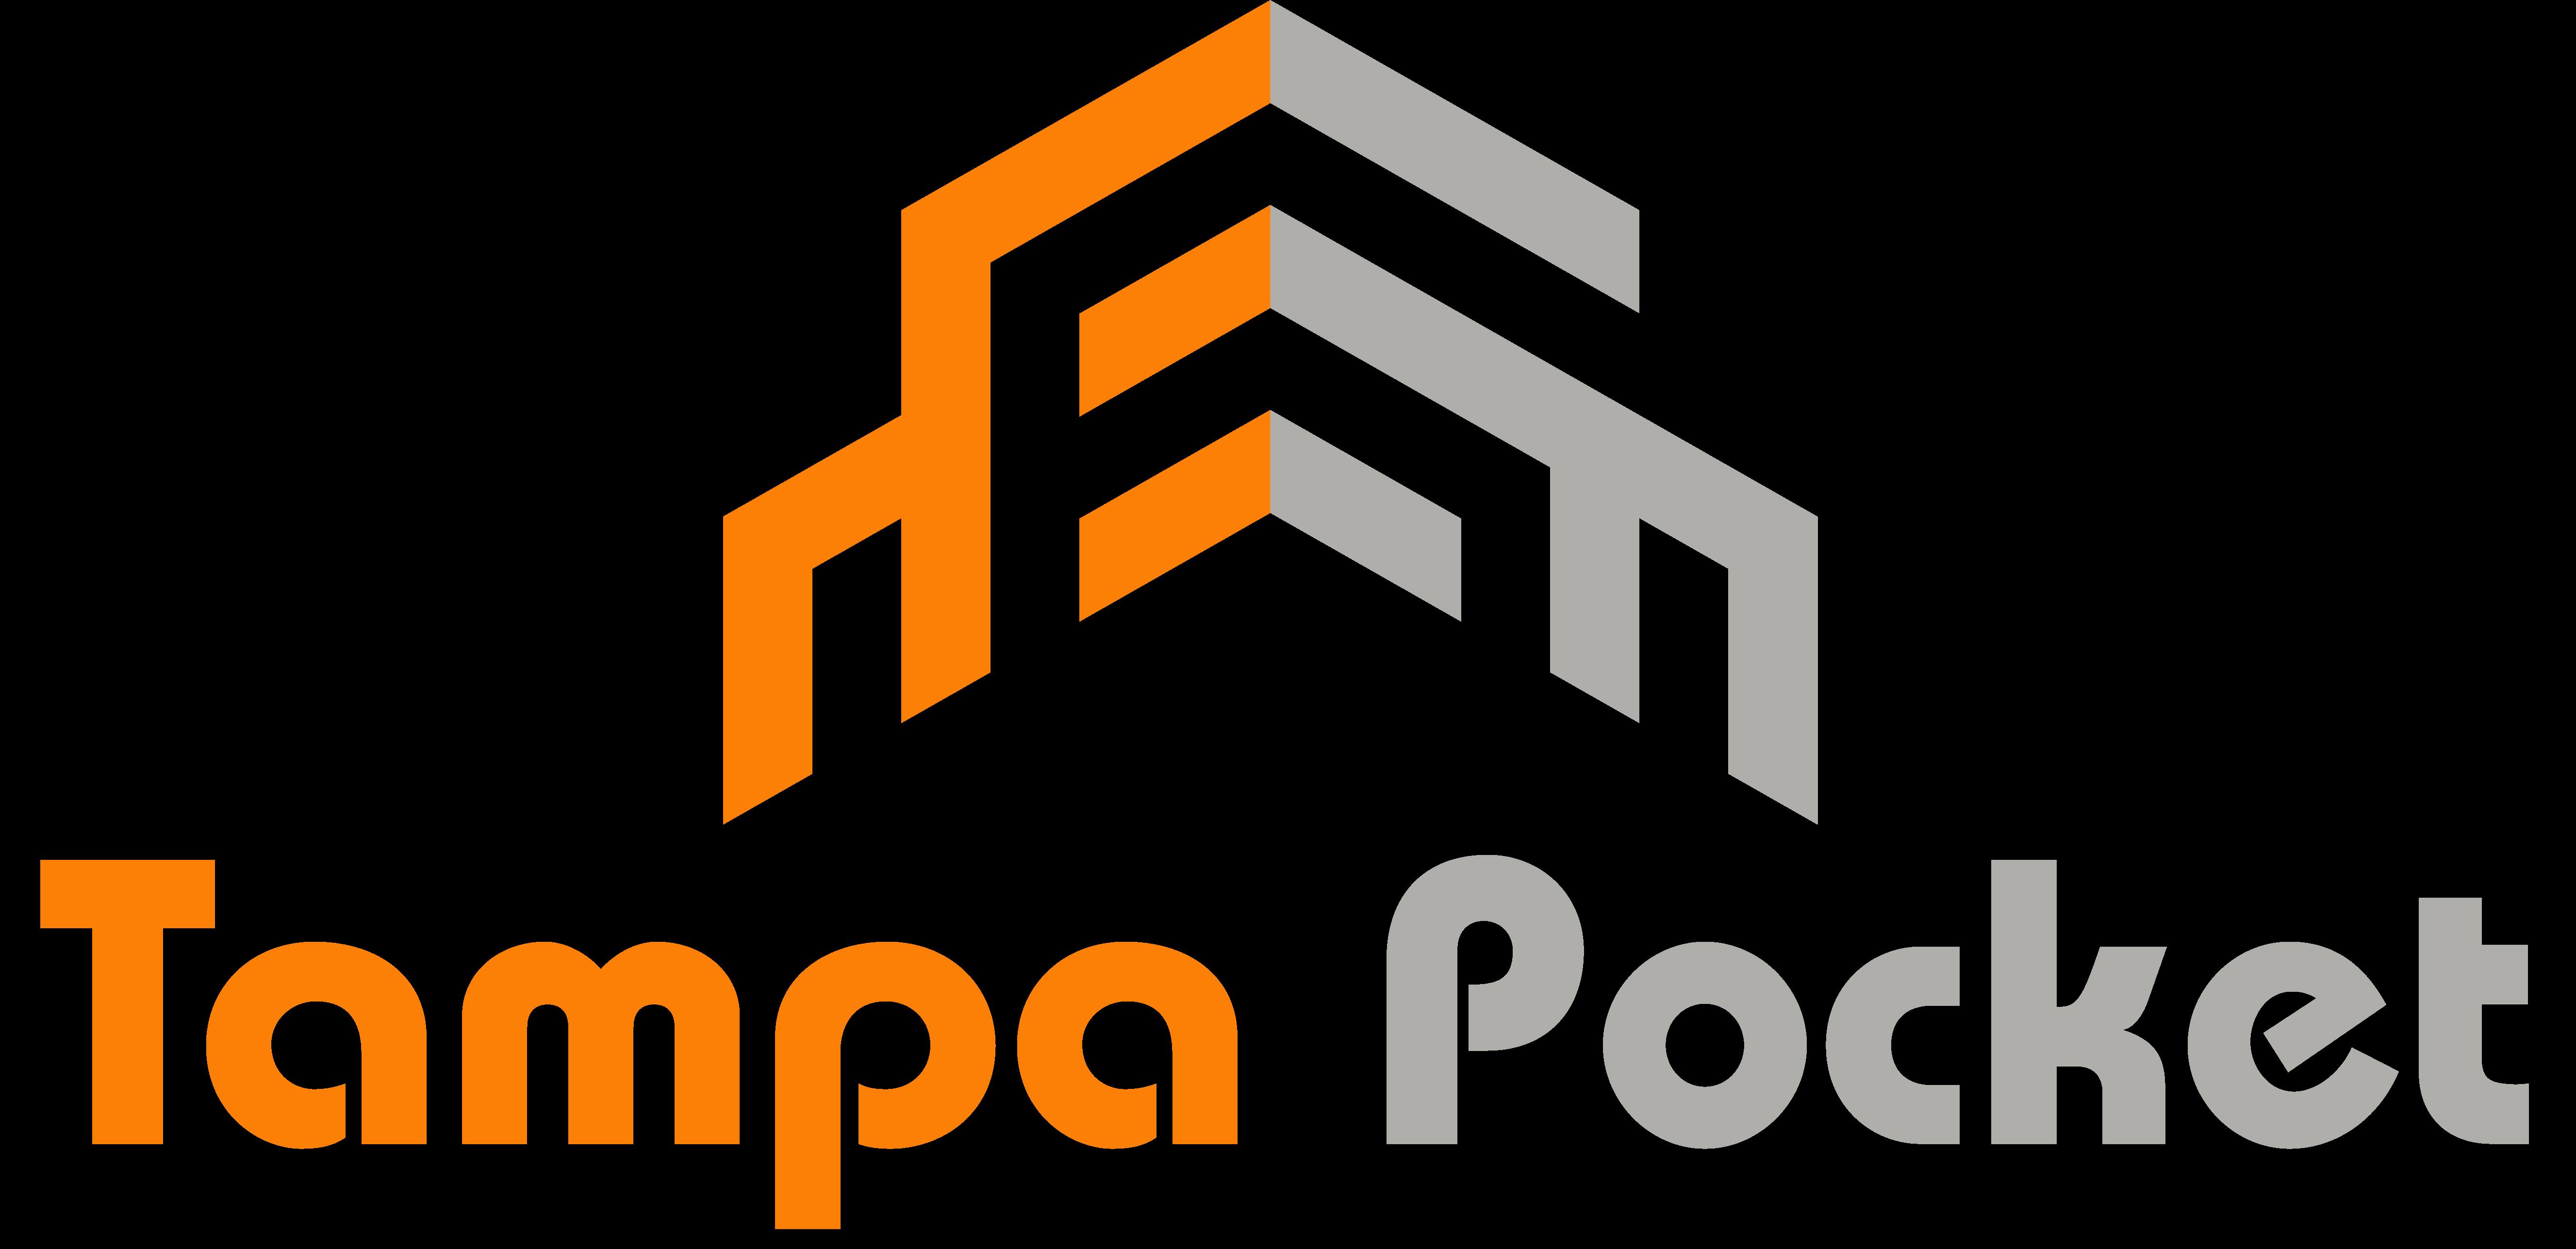 Tampa Pocket